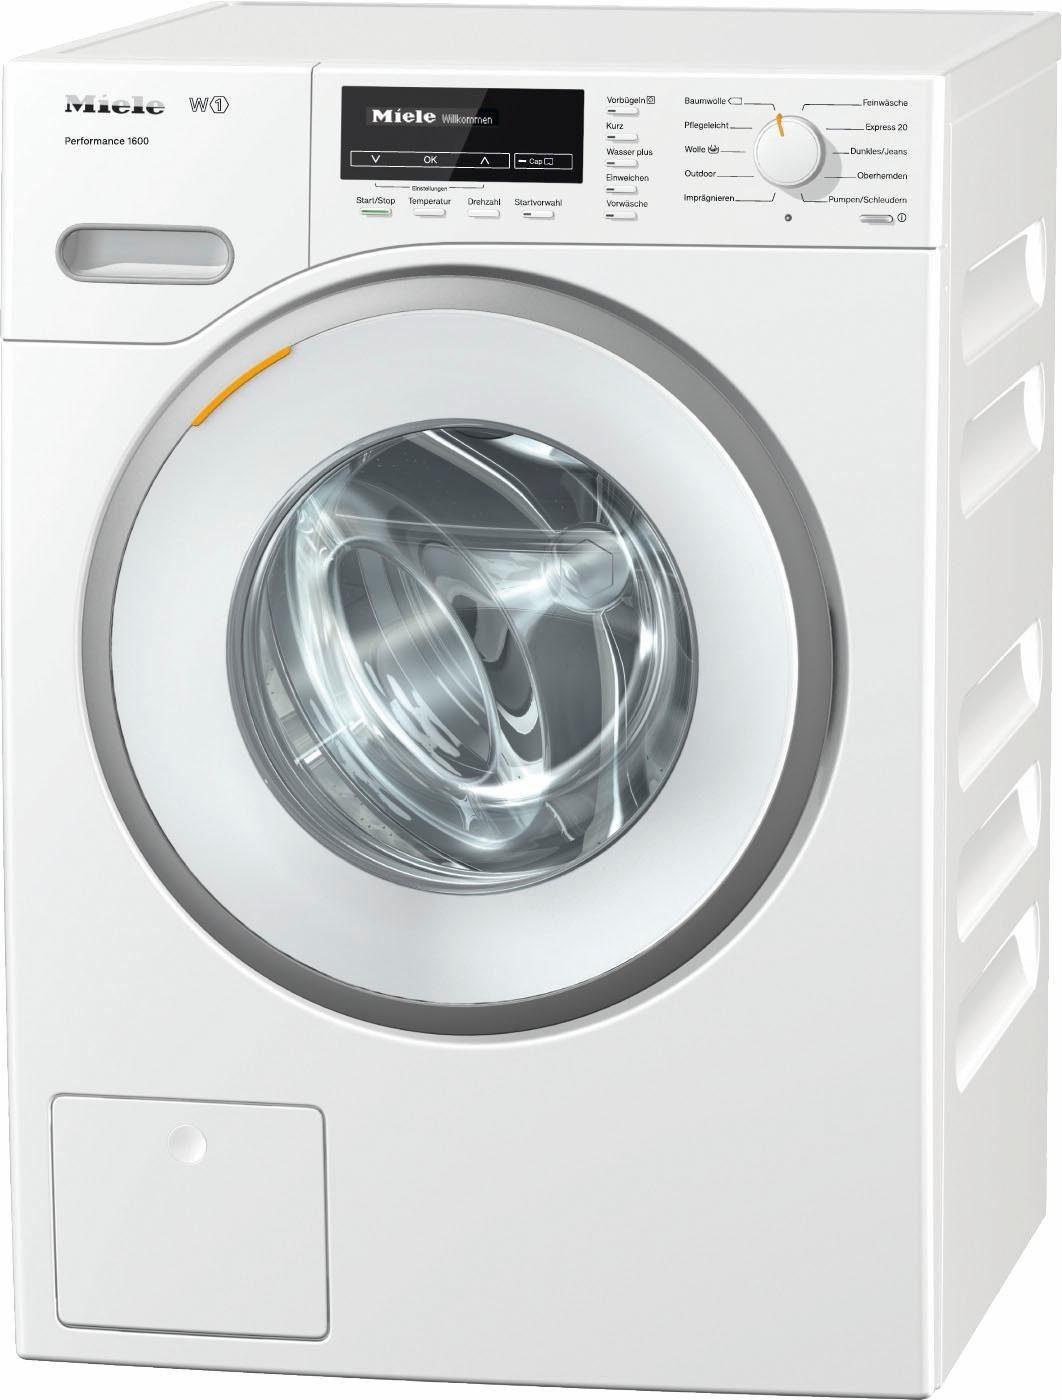 MIELE Waschmaschine W1 Performance 1600, A+++, 8 kg, 1600 U/Min